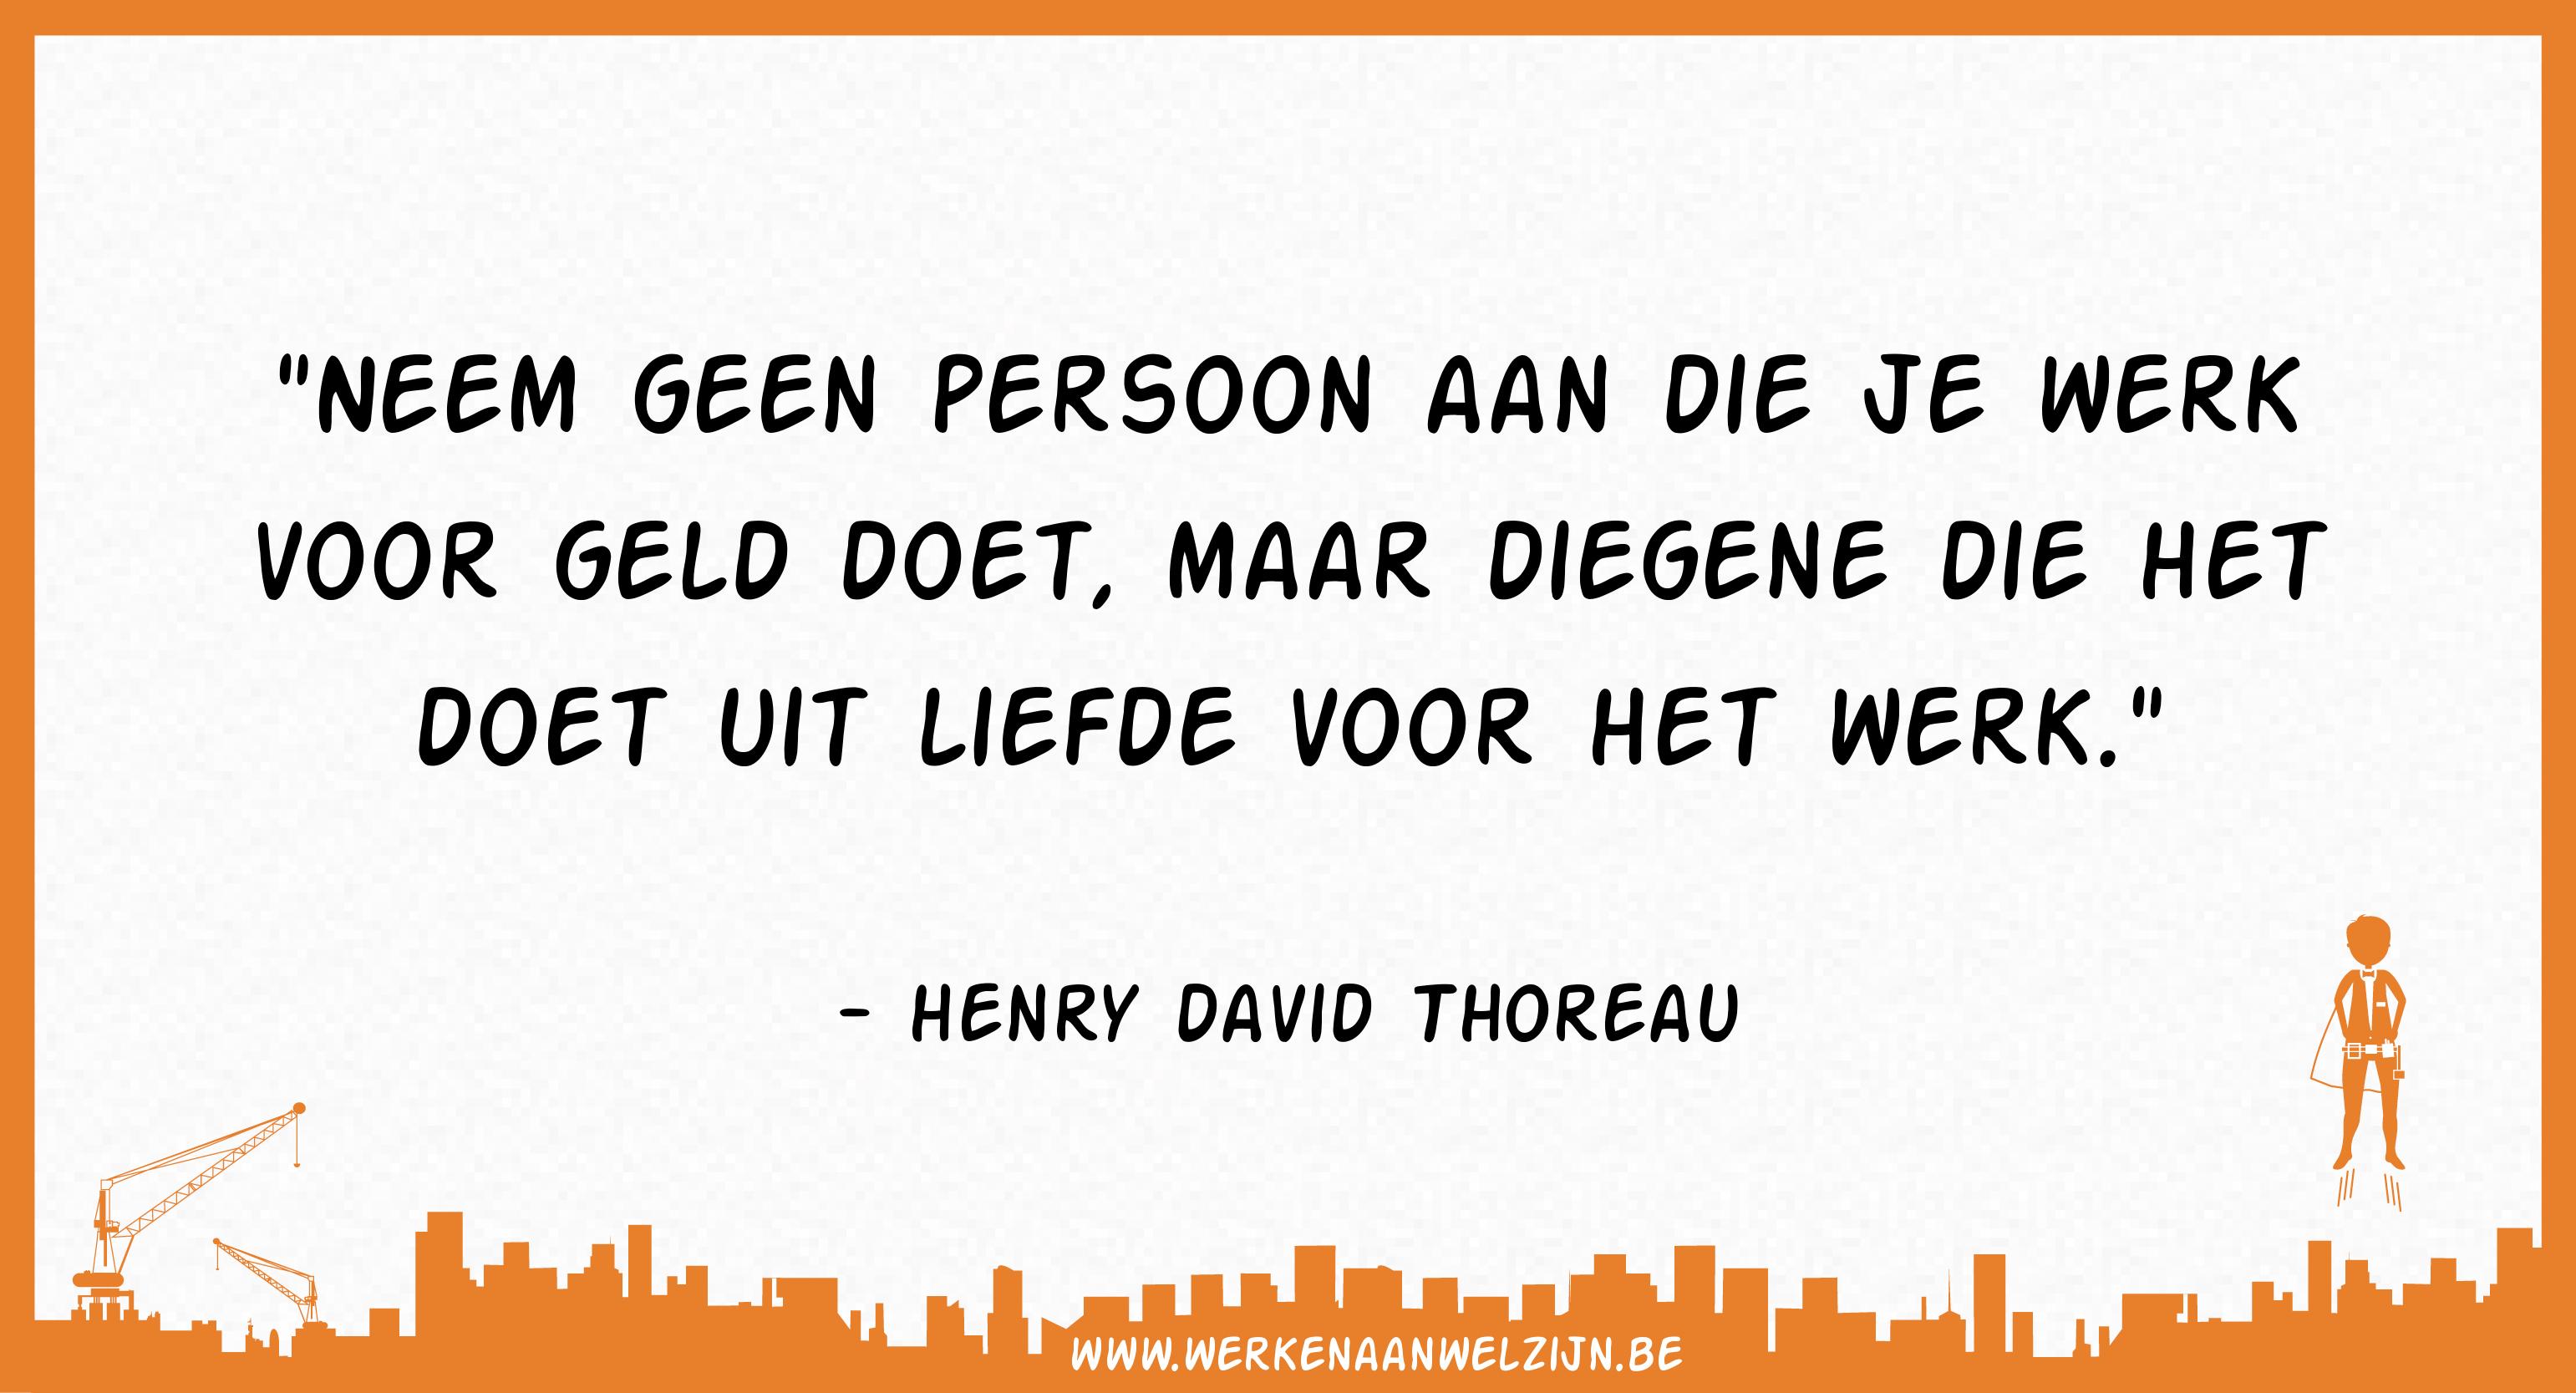 Neem geen persoon aan die je werk voor geld doet, maar diegene die het doet uit liefde voor het werk (Henry David Thoreau)